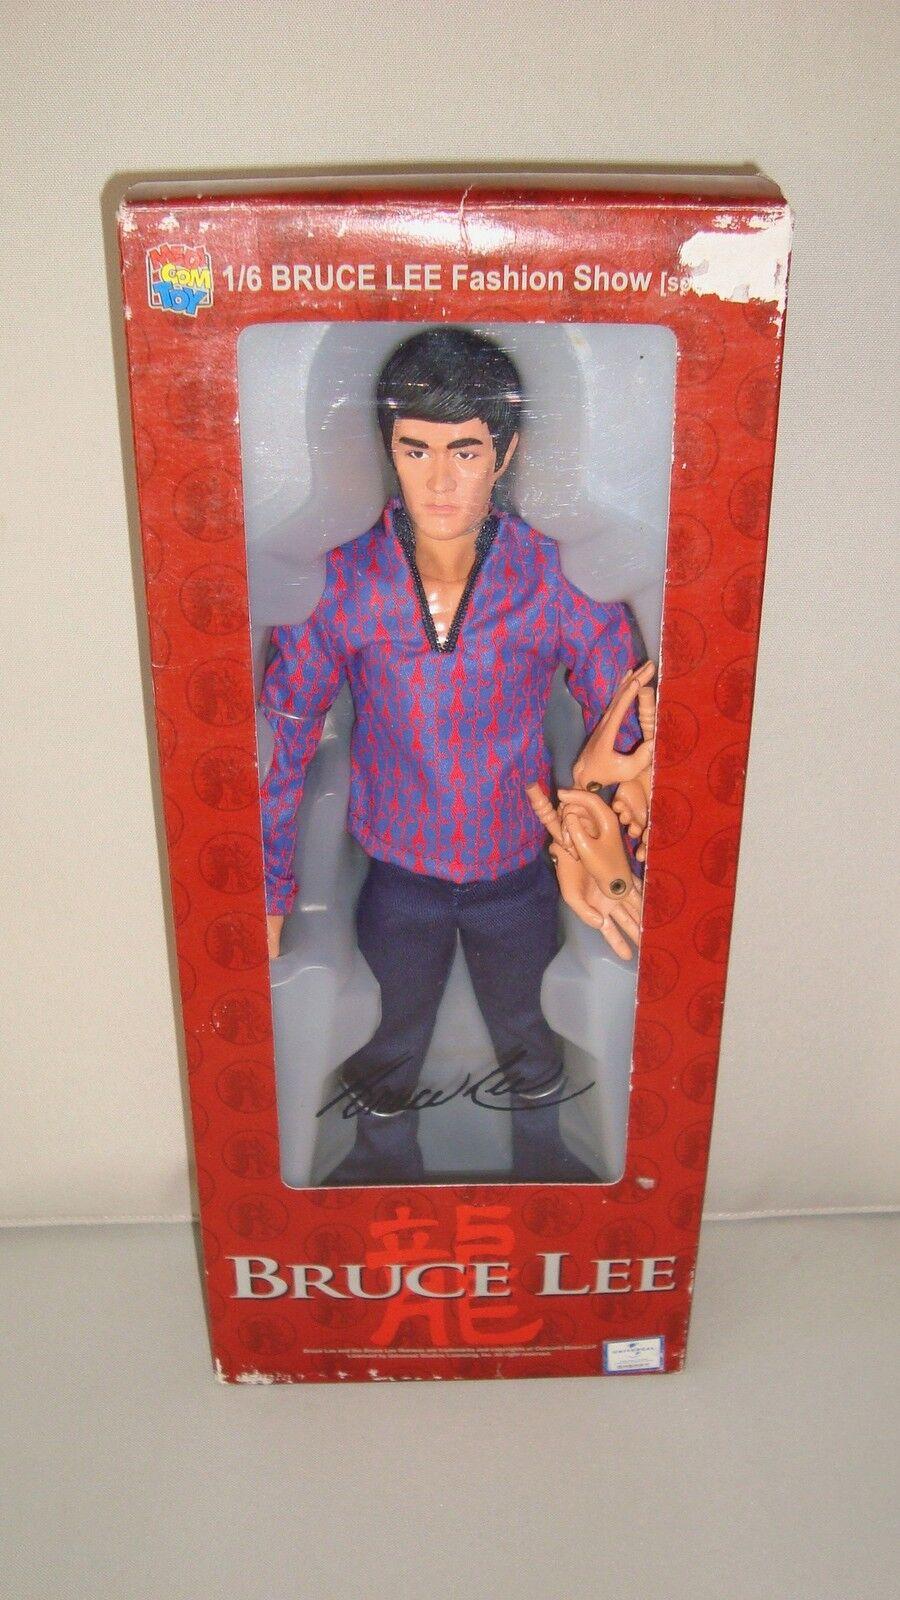 Raro Raro Raro Figura Maniquí Bruce Lee 1sur6 Moda Show Serie 4 Medicom Toy 26cm de138c